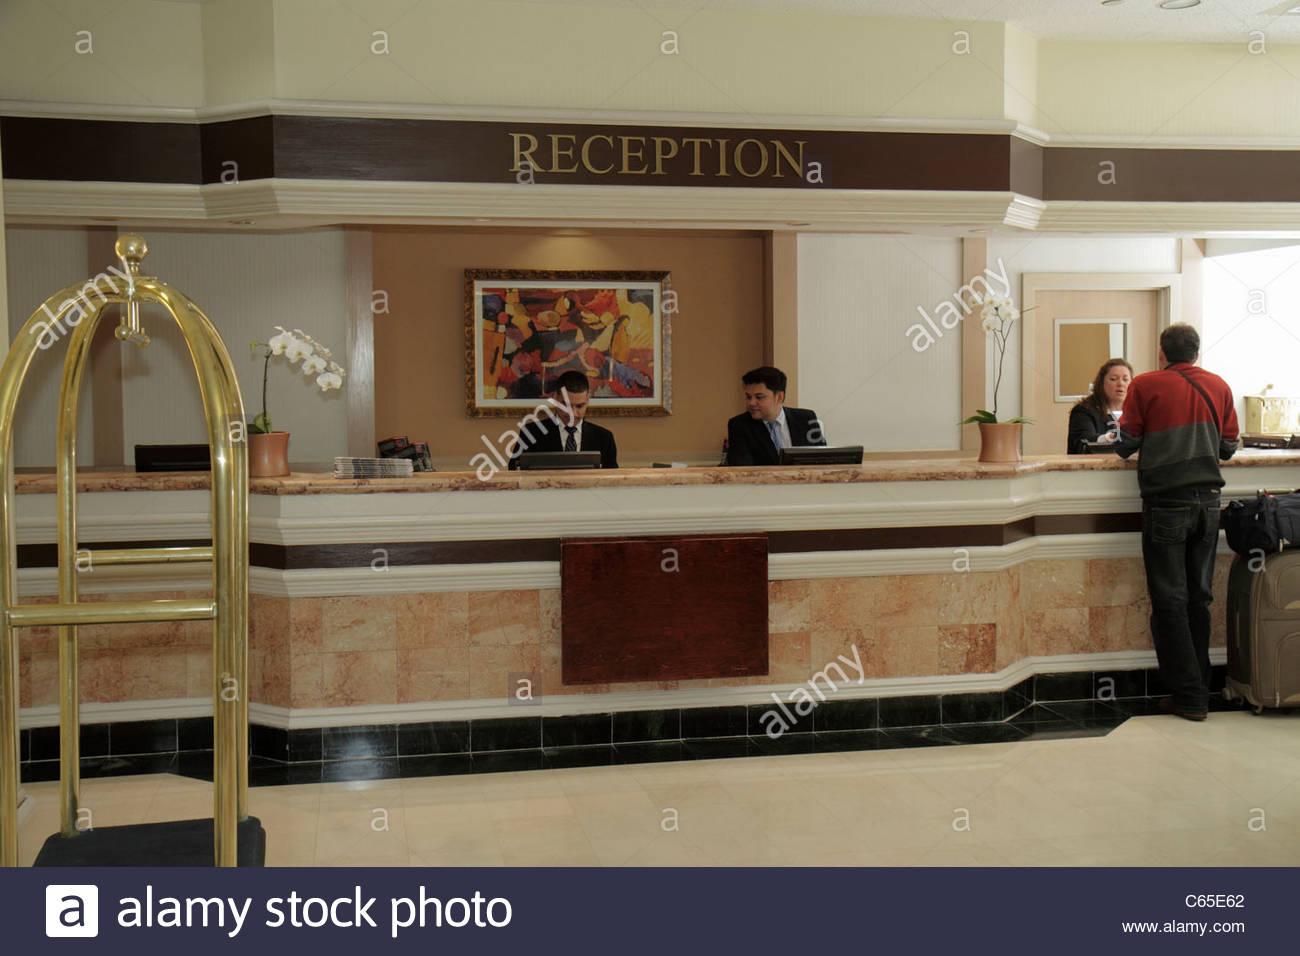 Manhattan New York City Nyc Ny Midtown Sheraton New York Hotel And Rh Alamy  Com Hotel Front Desk Jobs Nyc Salary Front Desk Hotel Jobs New York